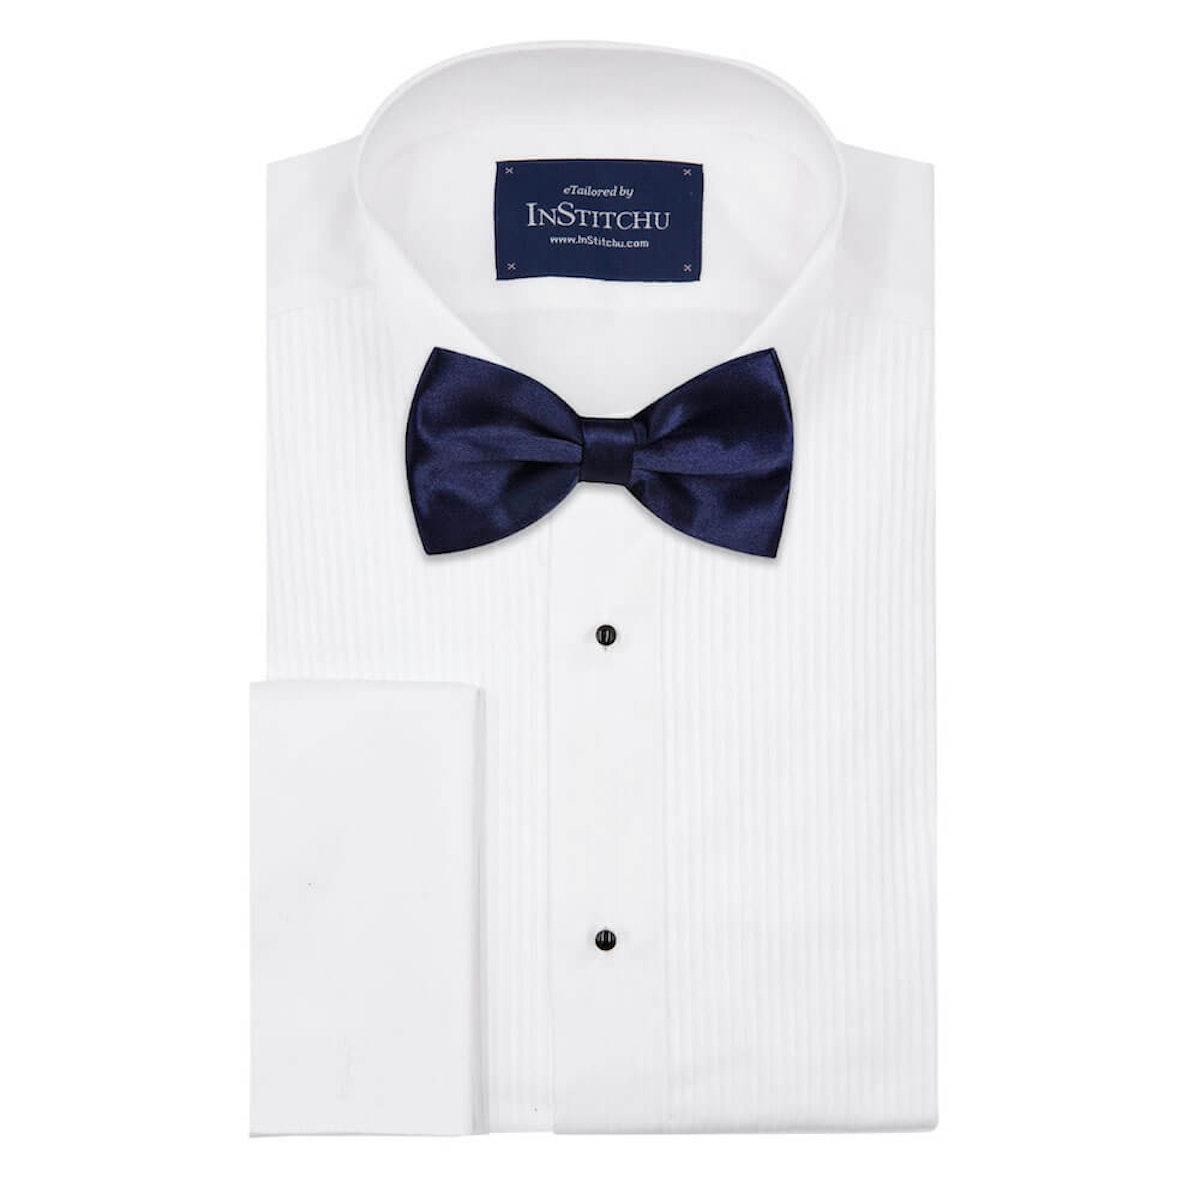 InStitchu Accessories bow-tie InStitchu Navy Bow Tie on shirt